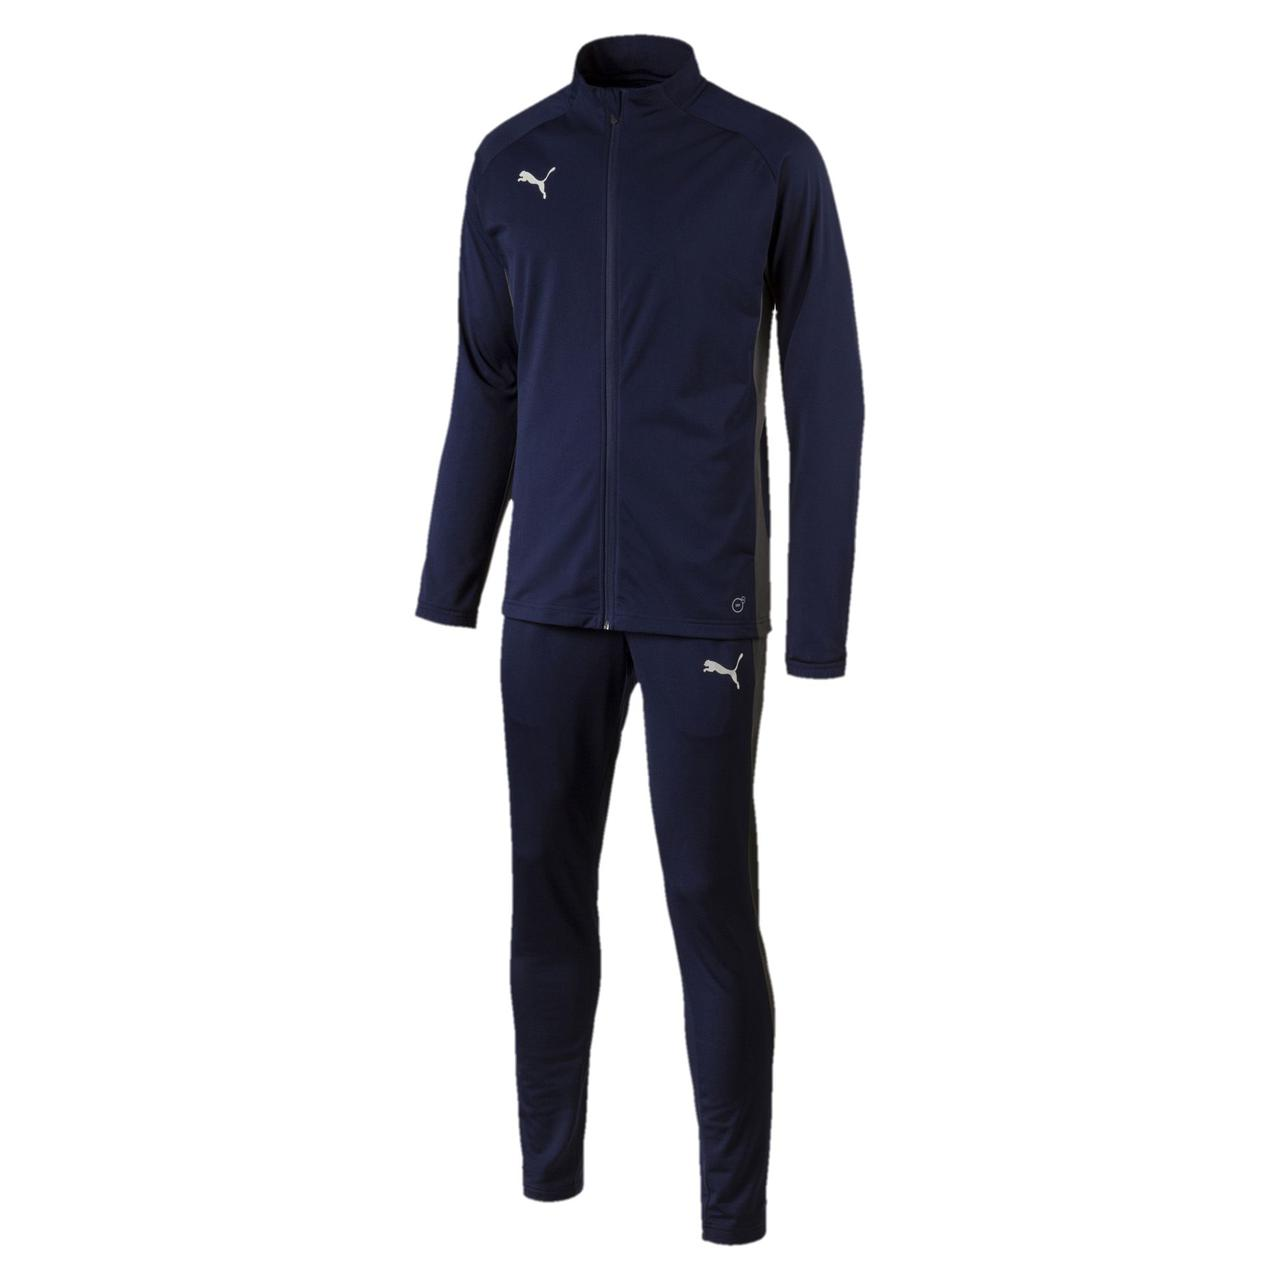 6e2fd62a28b8 Купить Костюм спортивный мужской Puma ftblNXT 655580 03 (темно-синий,  полиэстер, для ...